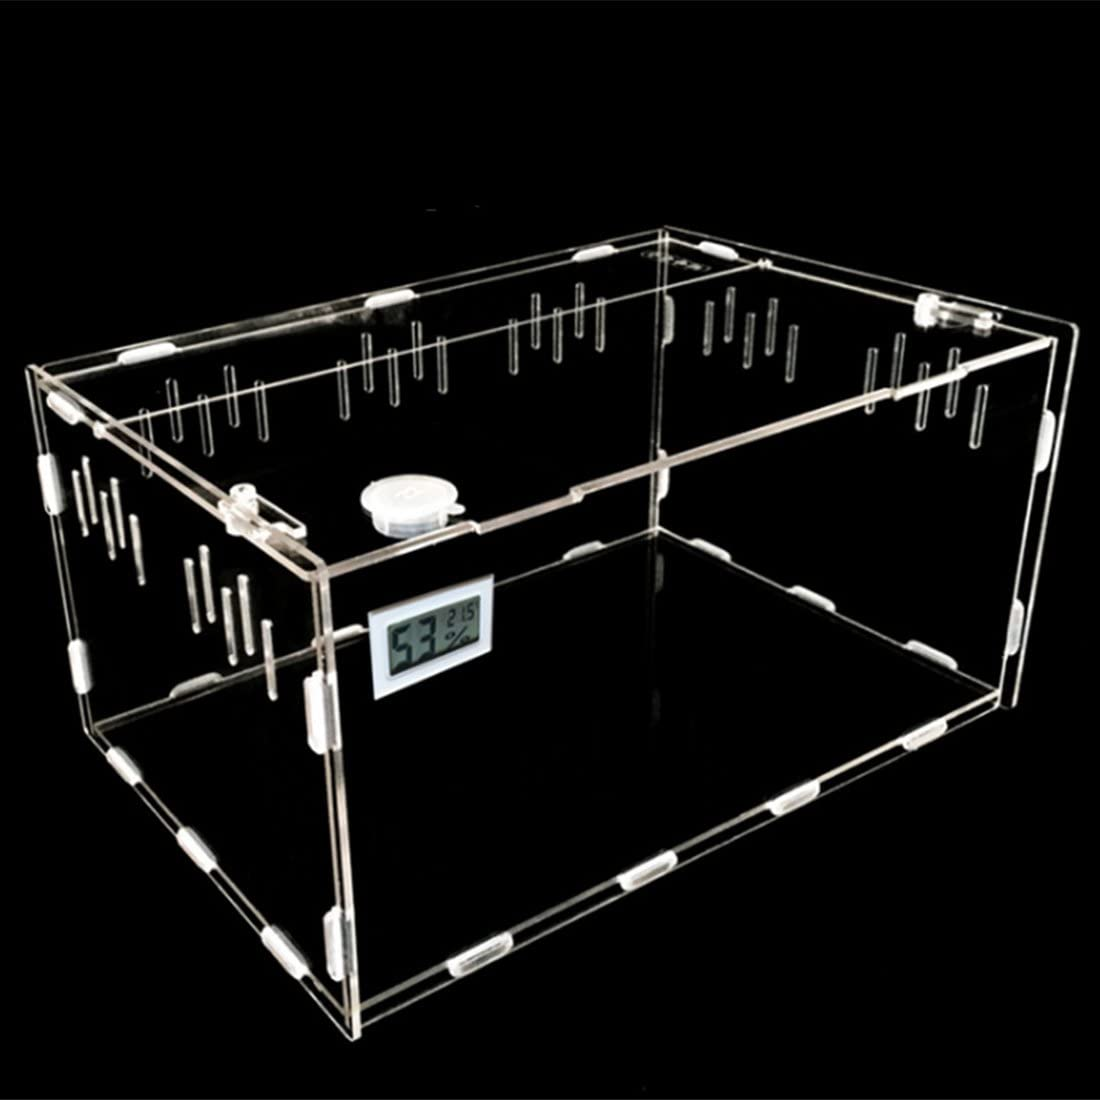 Petforu Aquarium Breeding Tank Luxury goods Acrylic with trust Feeding Box Reptile